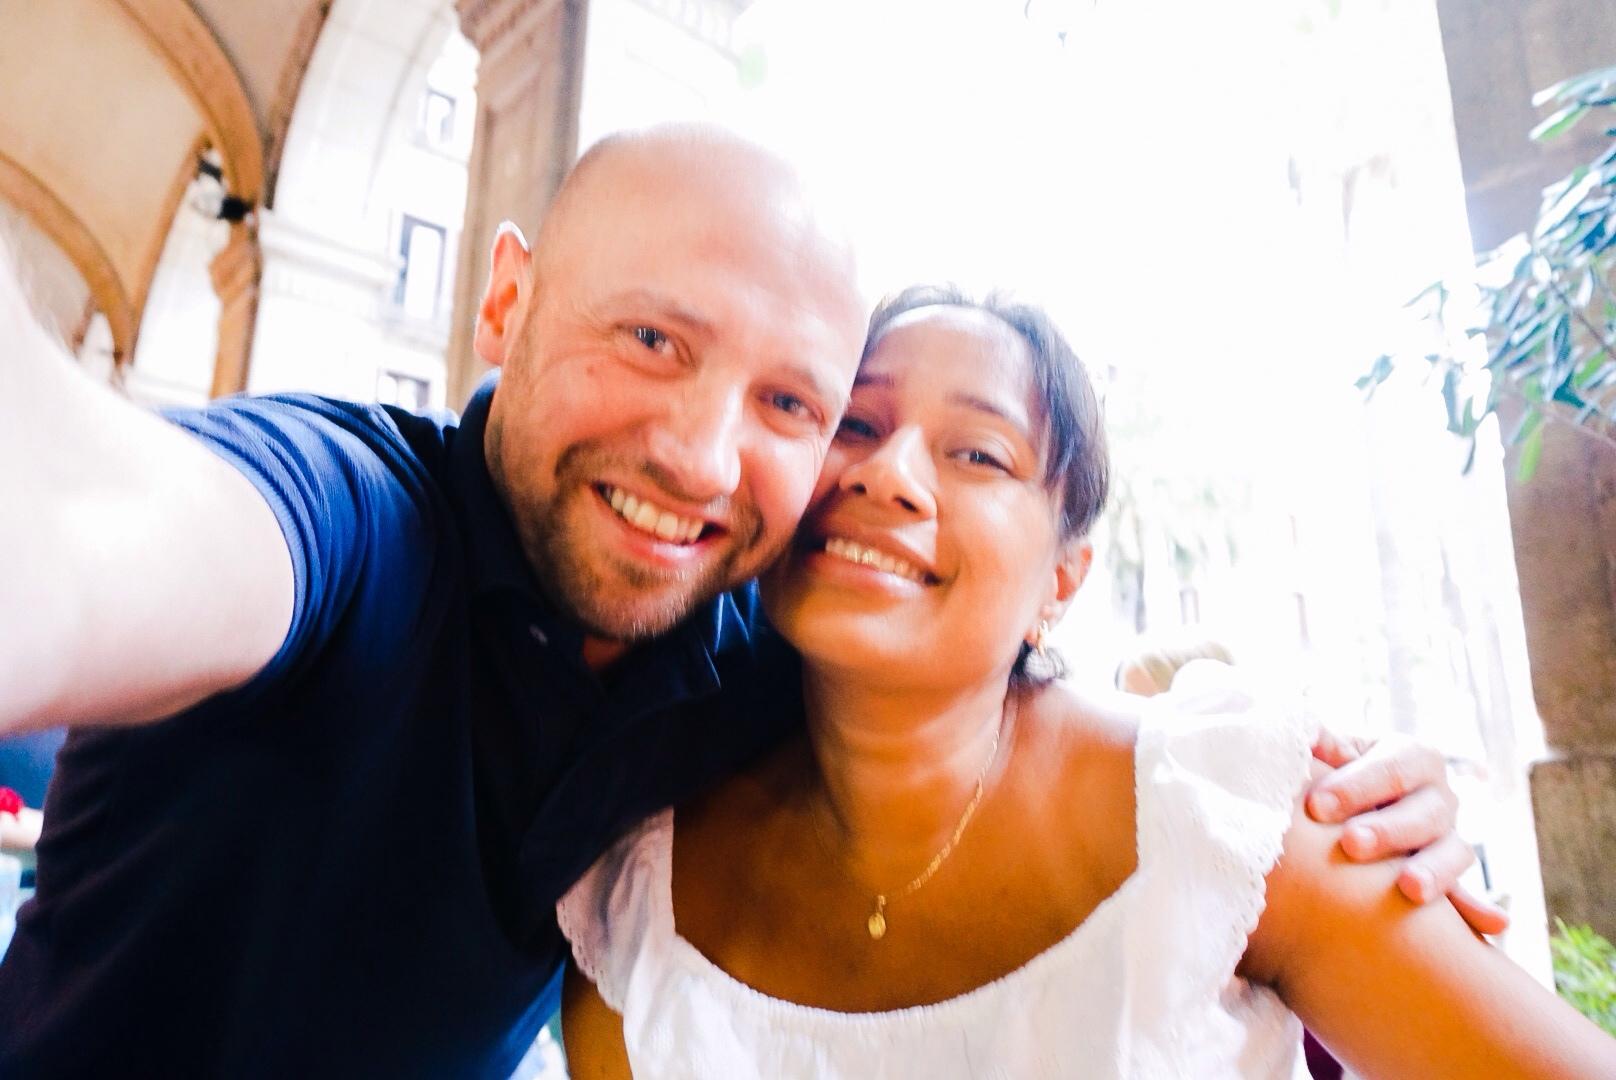 Martijn and wife, Janntsi